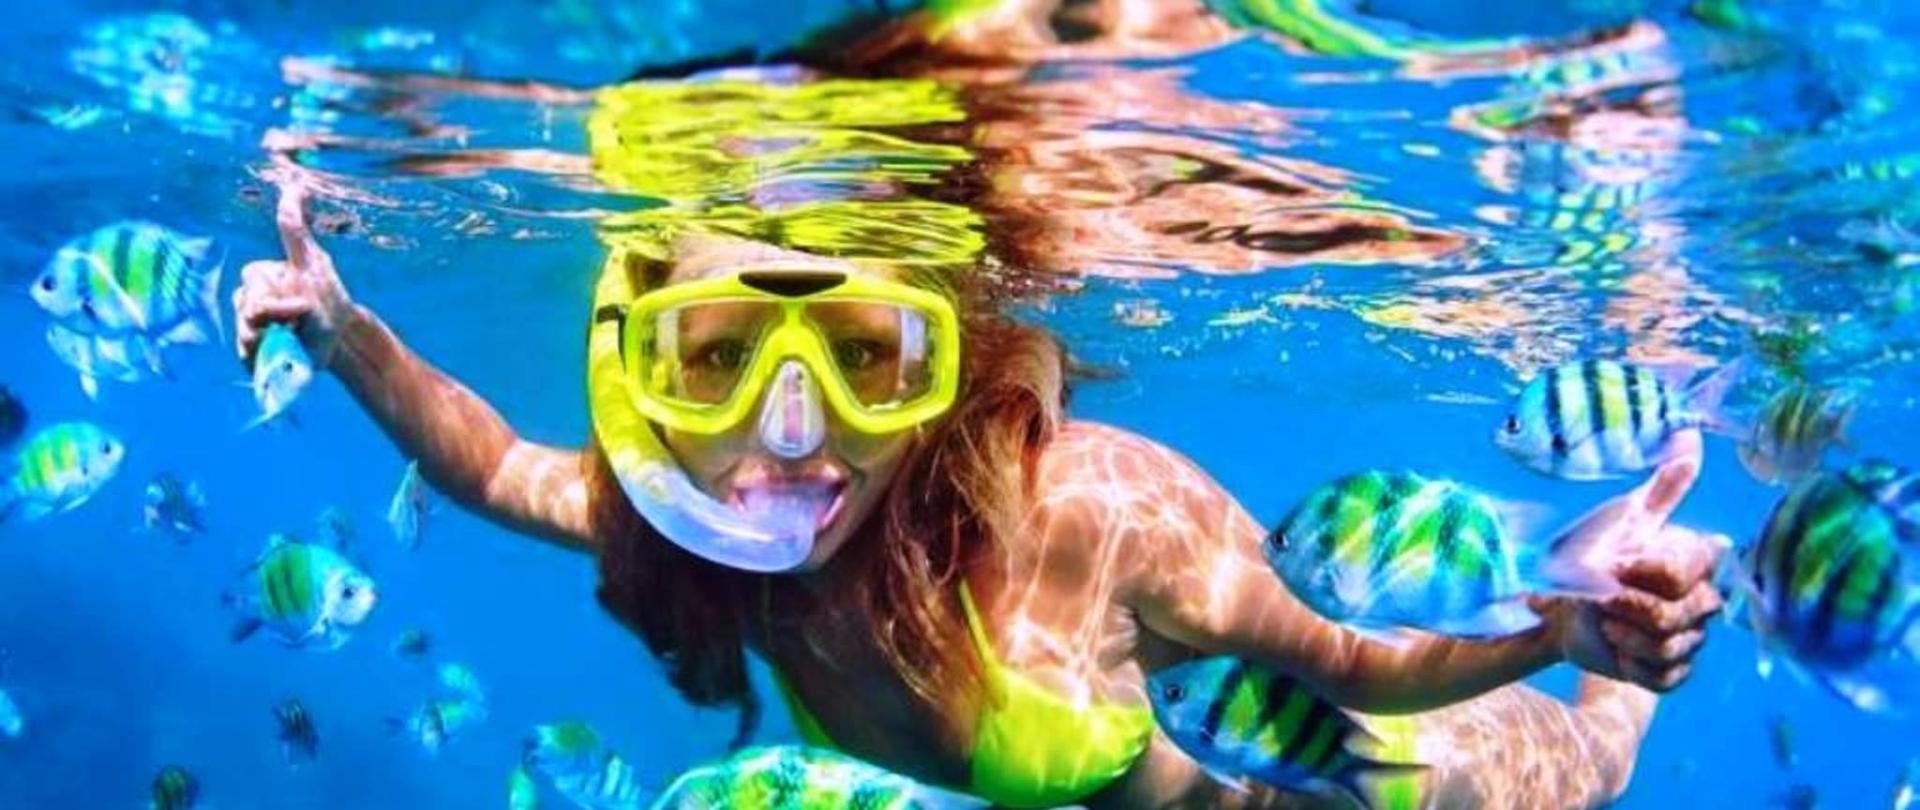 mergulho-com-snorkel-15a3228d8d4265-large.jpg